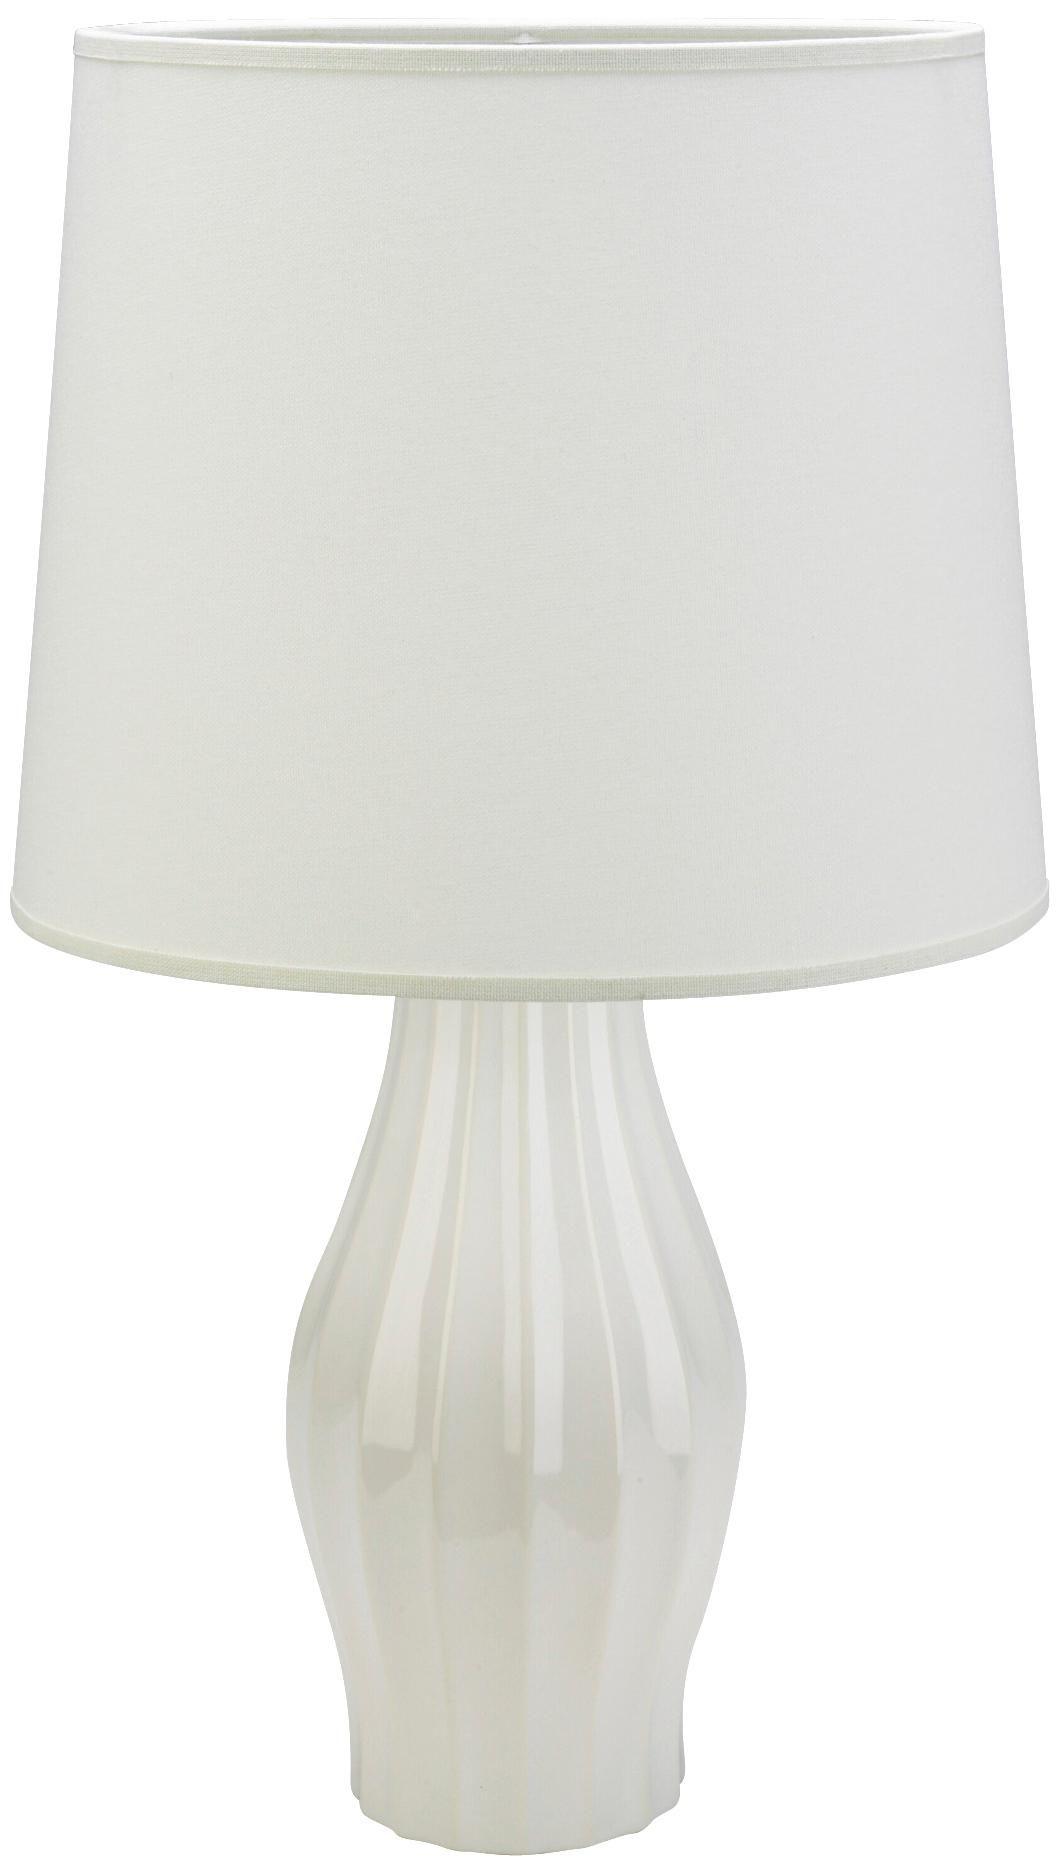 Haeger Potteries White Fluted Ceramic Table Lamp 36702 Lamps Plus Table Lamp Ceramic Table Lamps Lamp